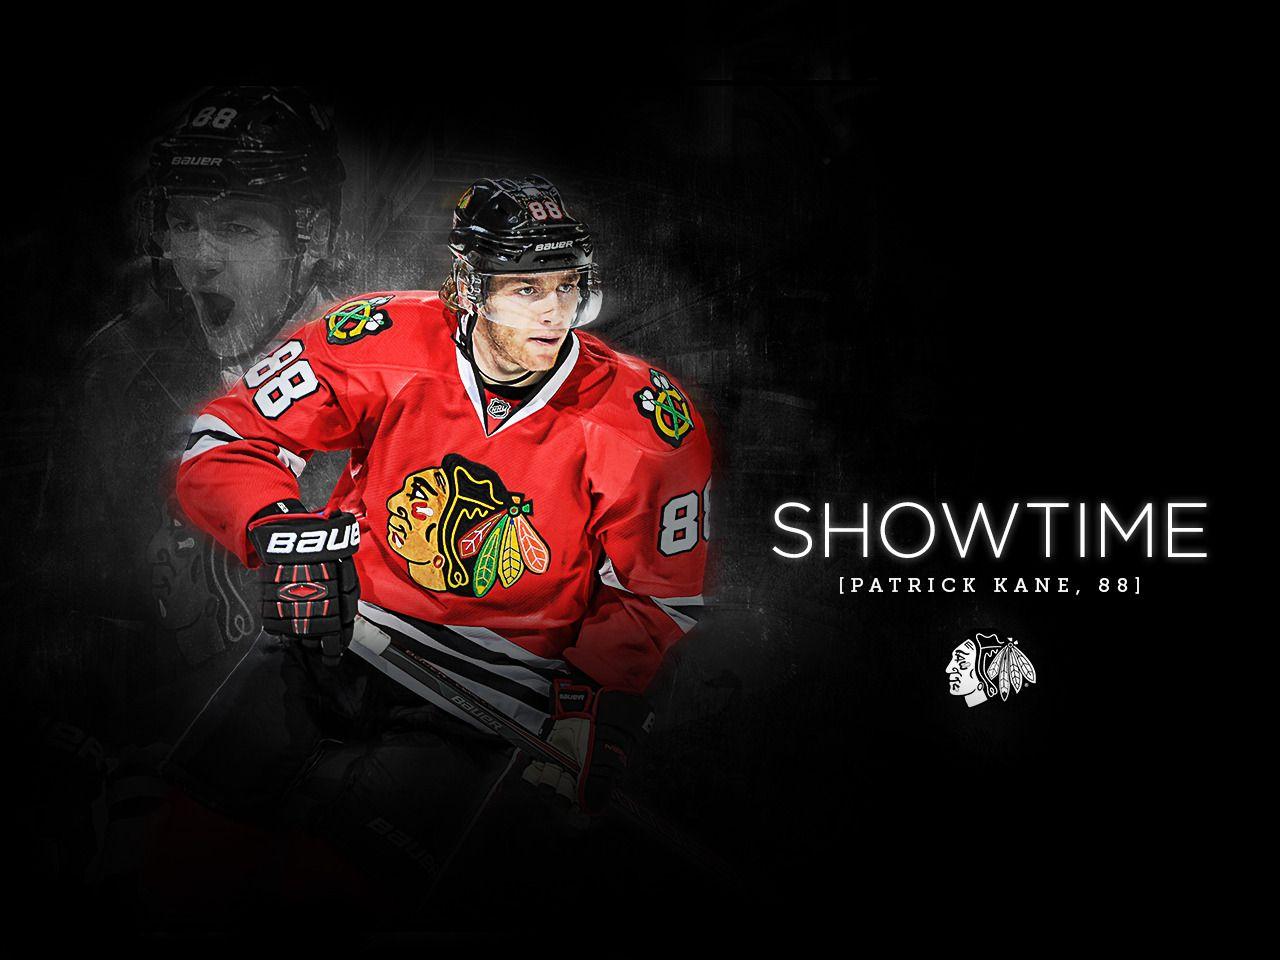 Patrick Kane Winter Classic 01 01 19 Chicago Blackhawks Wallpaper Chicago Blackhawks Hockey Blackhawks